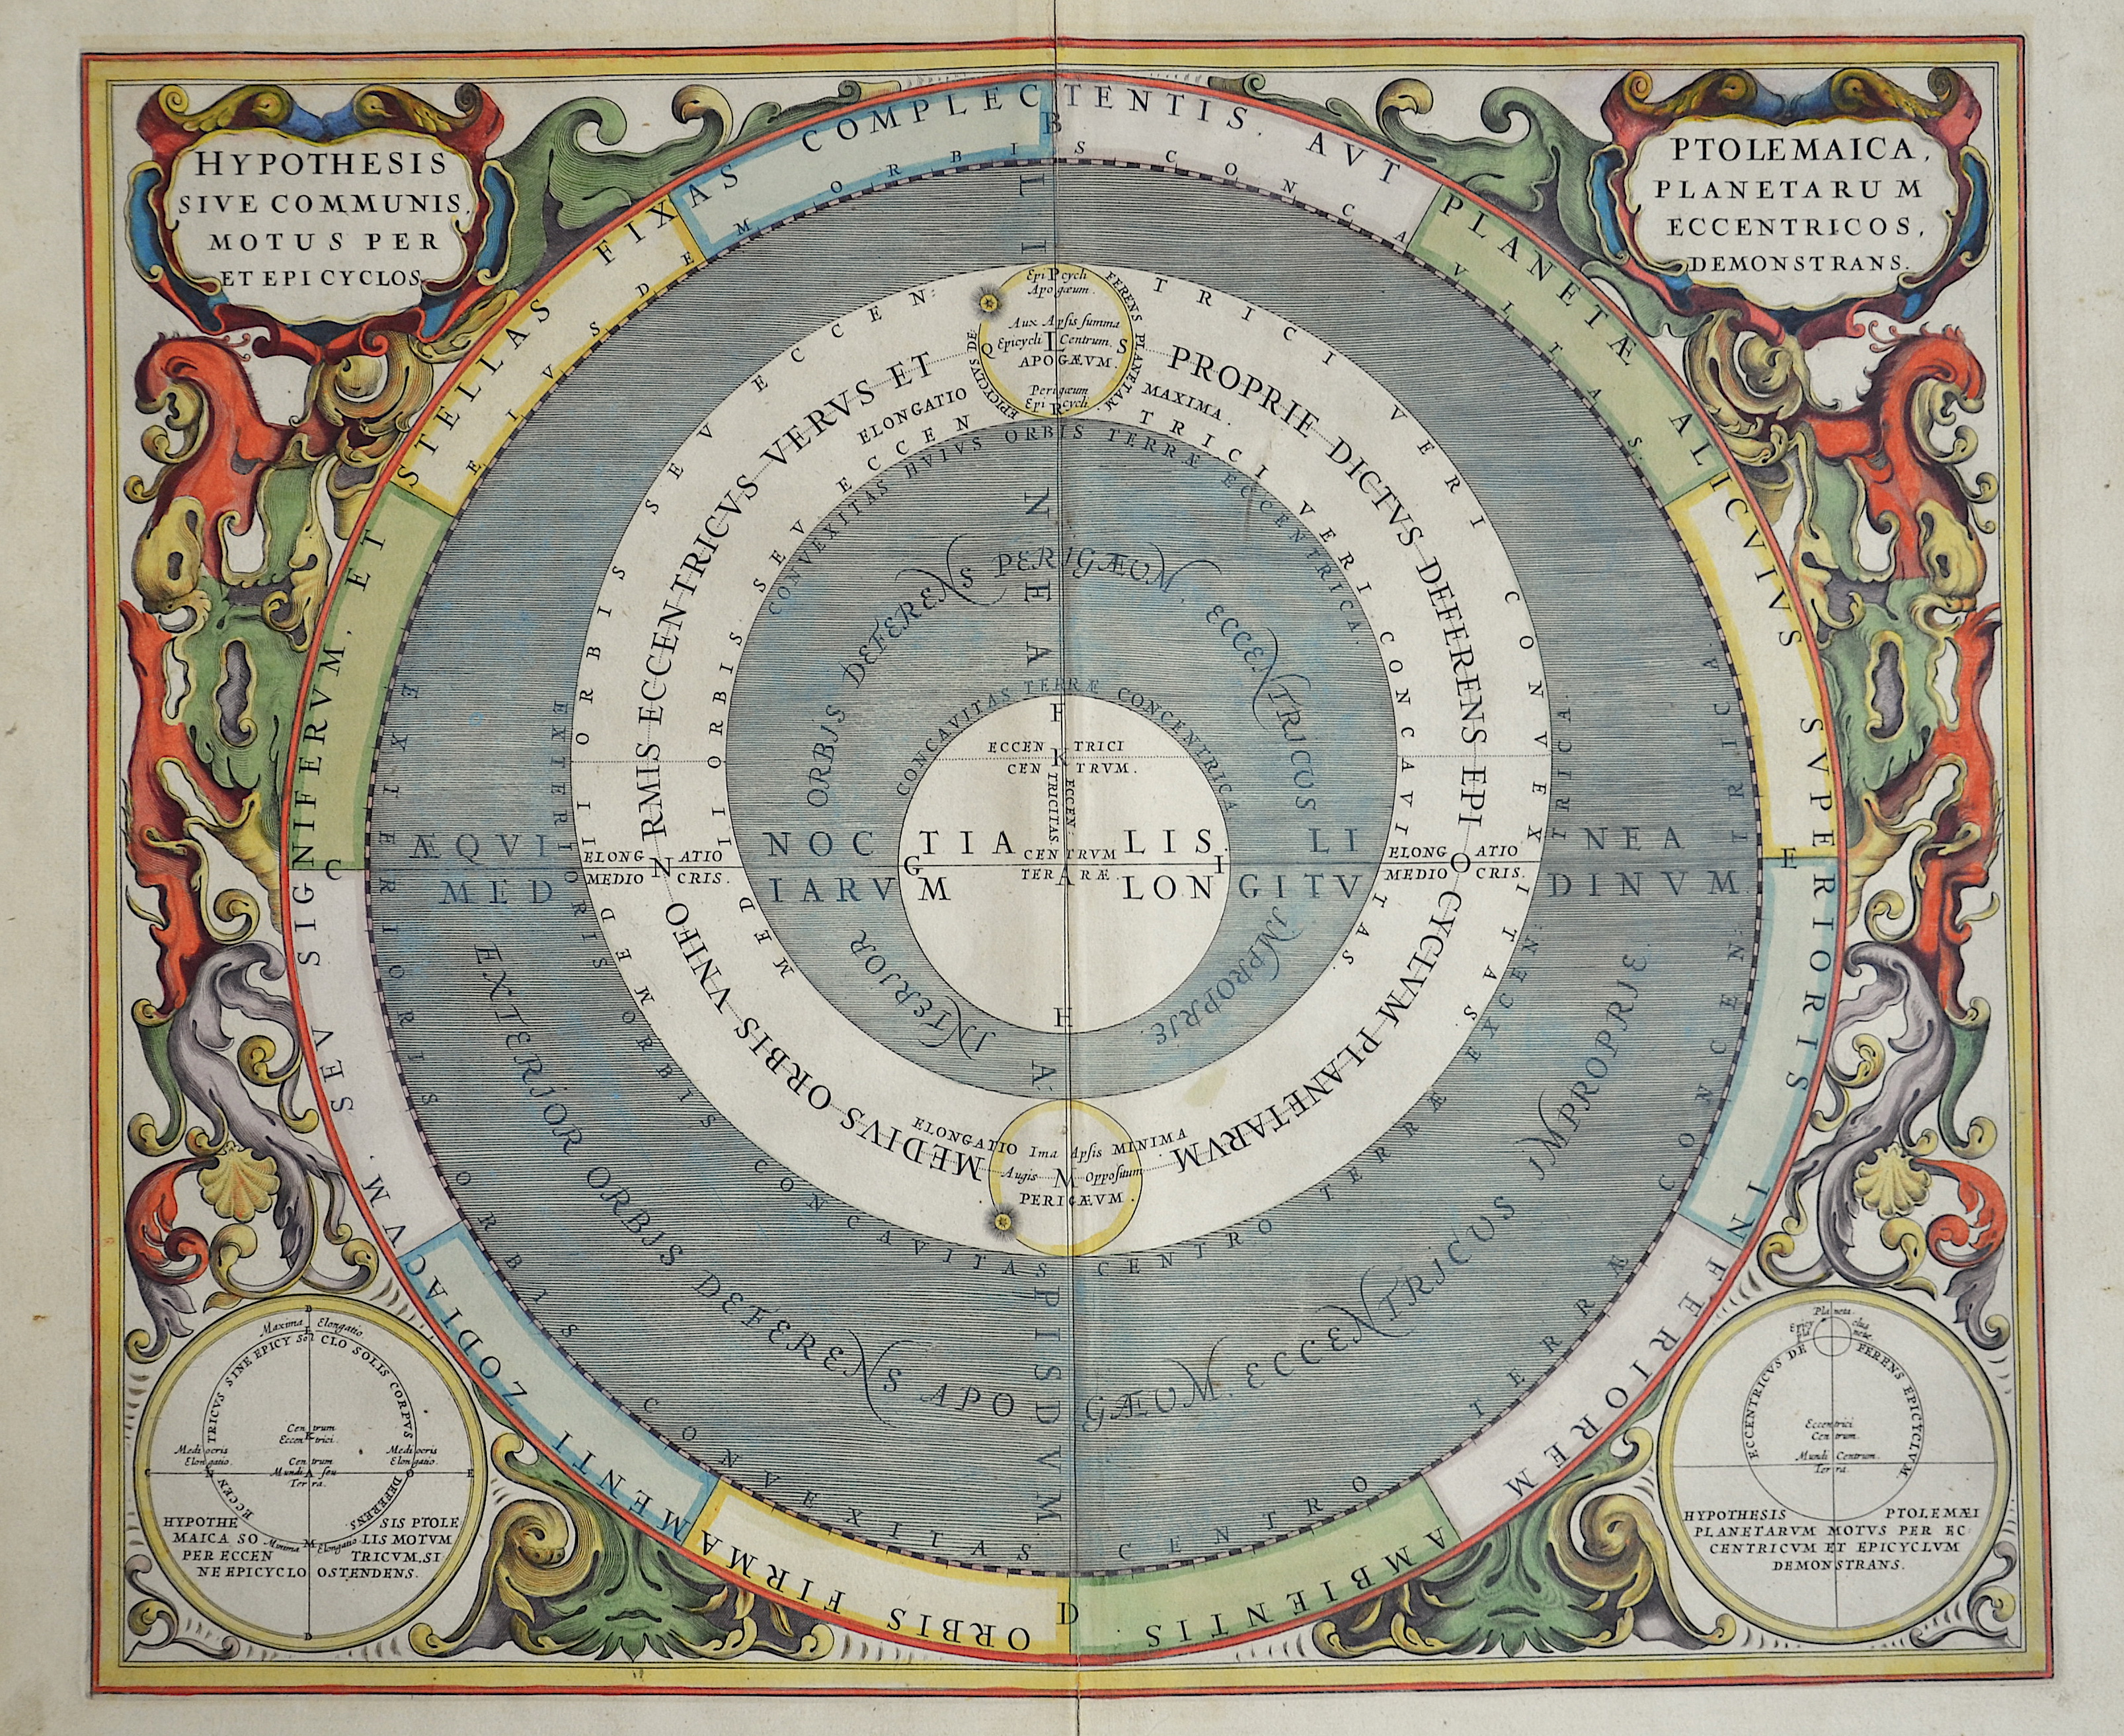 Cellarius / Schenk-Valk Andreas / Peter Hypothesis Ptolemaica sive Communis Planetarum Motus per Eccentricos et Epicyclos demonstrans